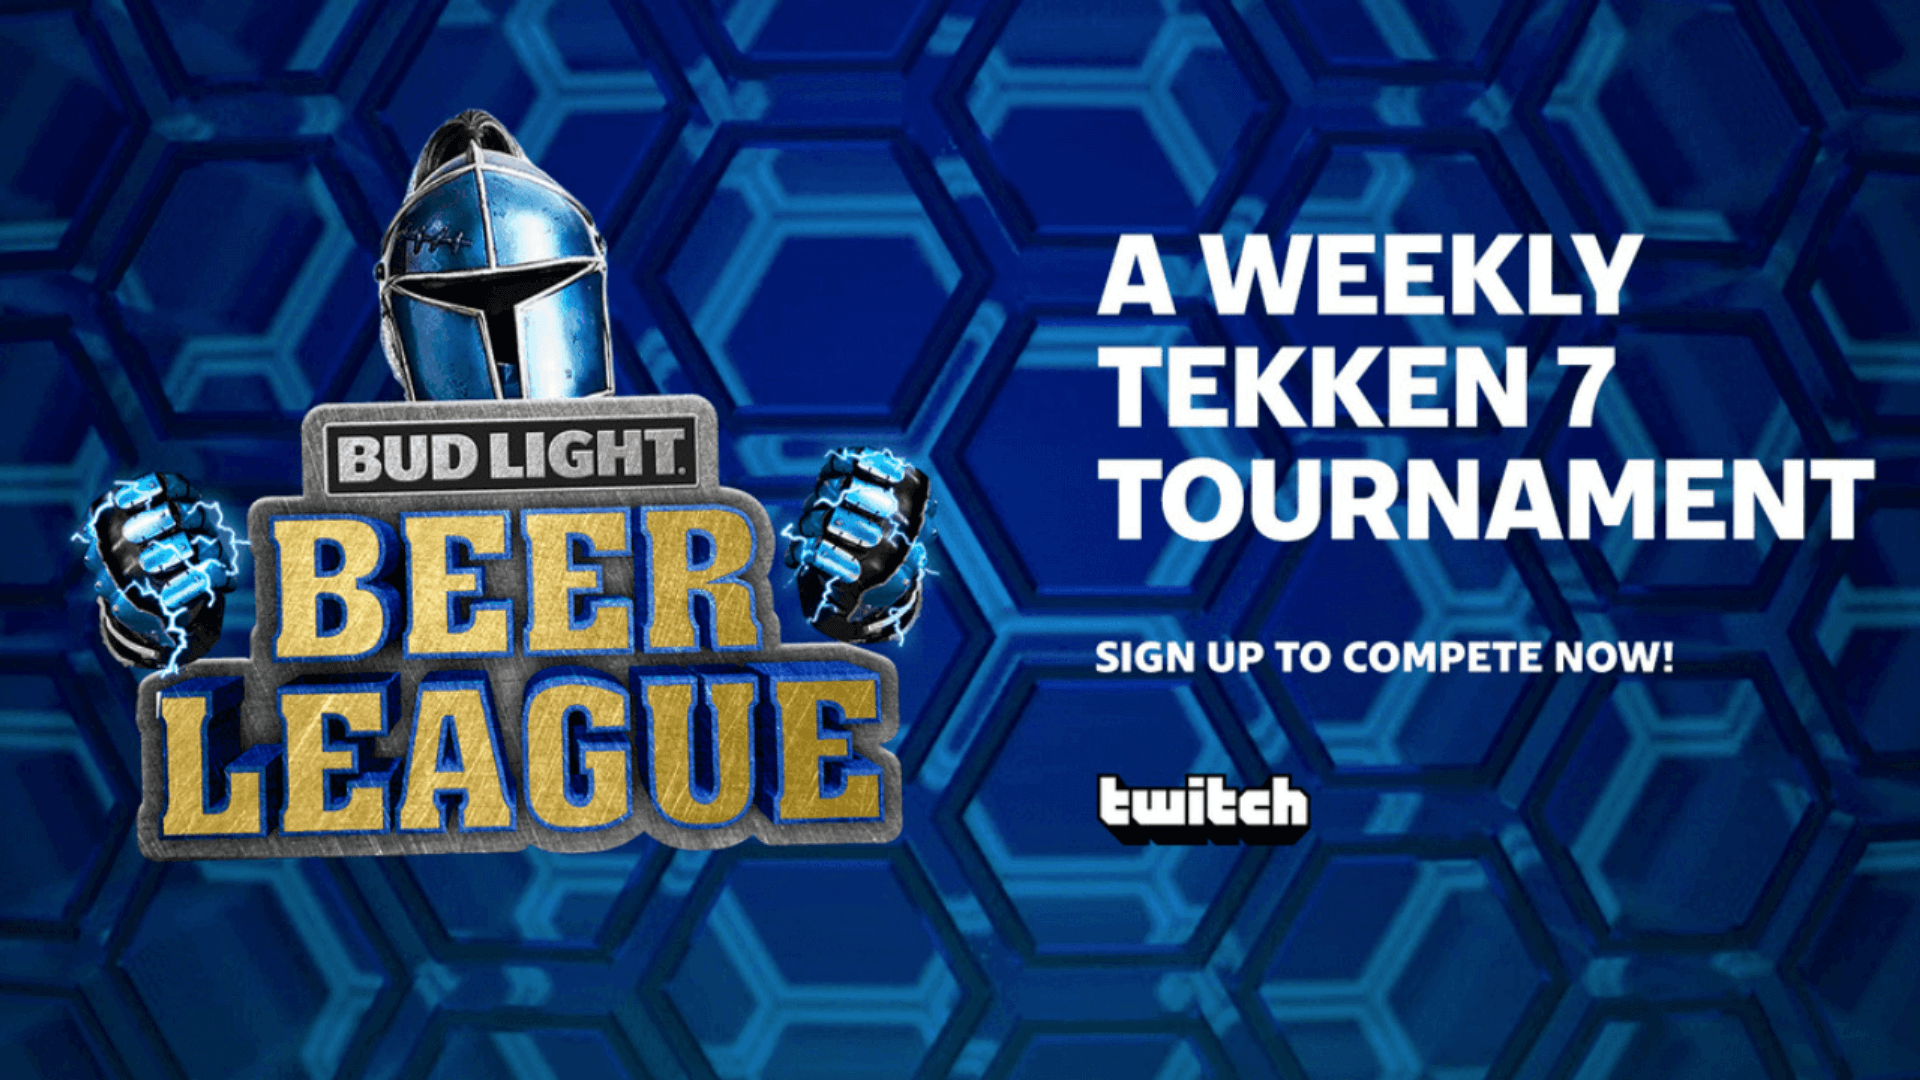 Bud Light Beer League Tekken 7 East Qualifier Changed The Leader